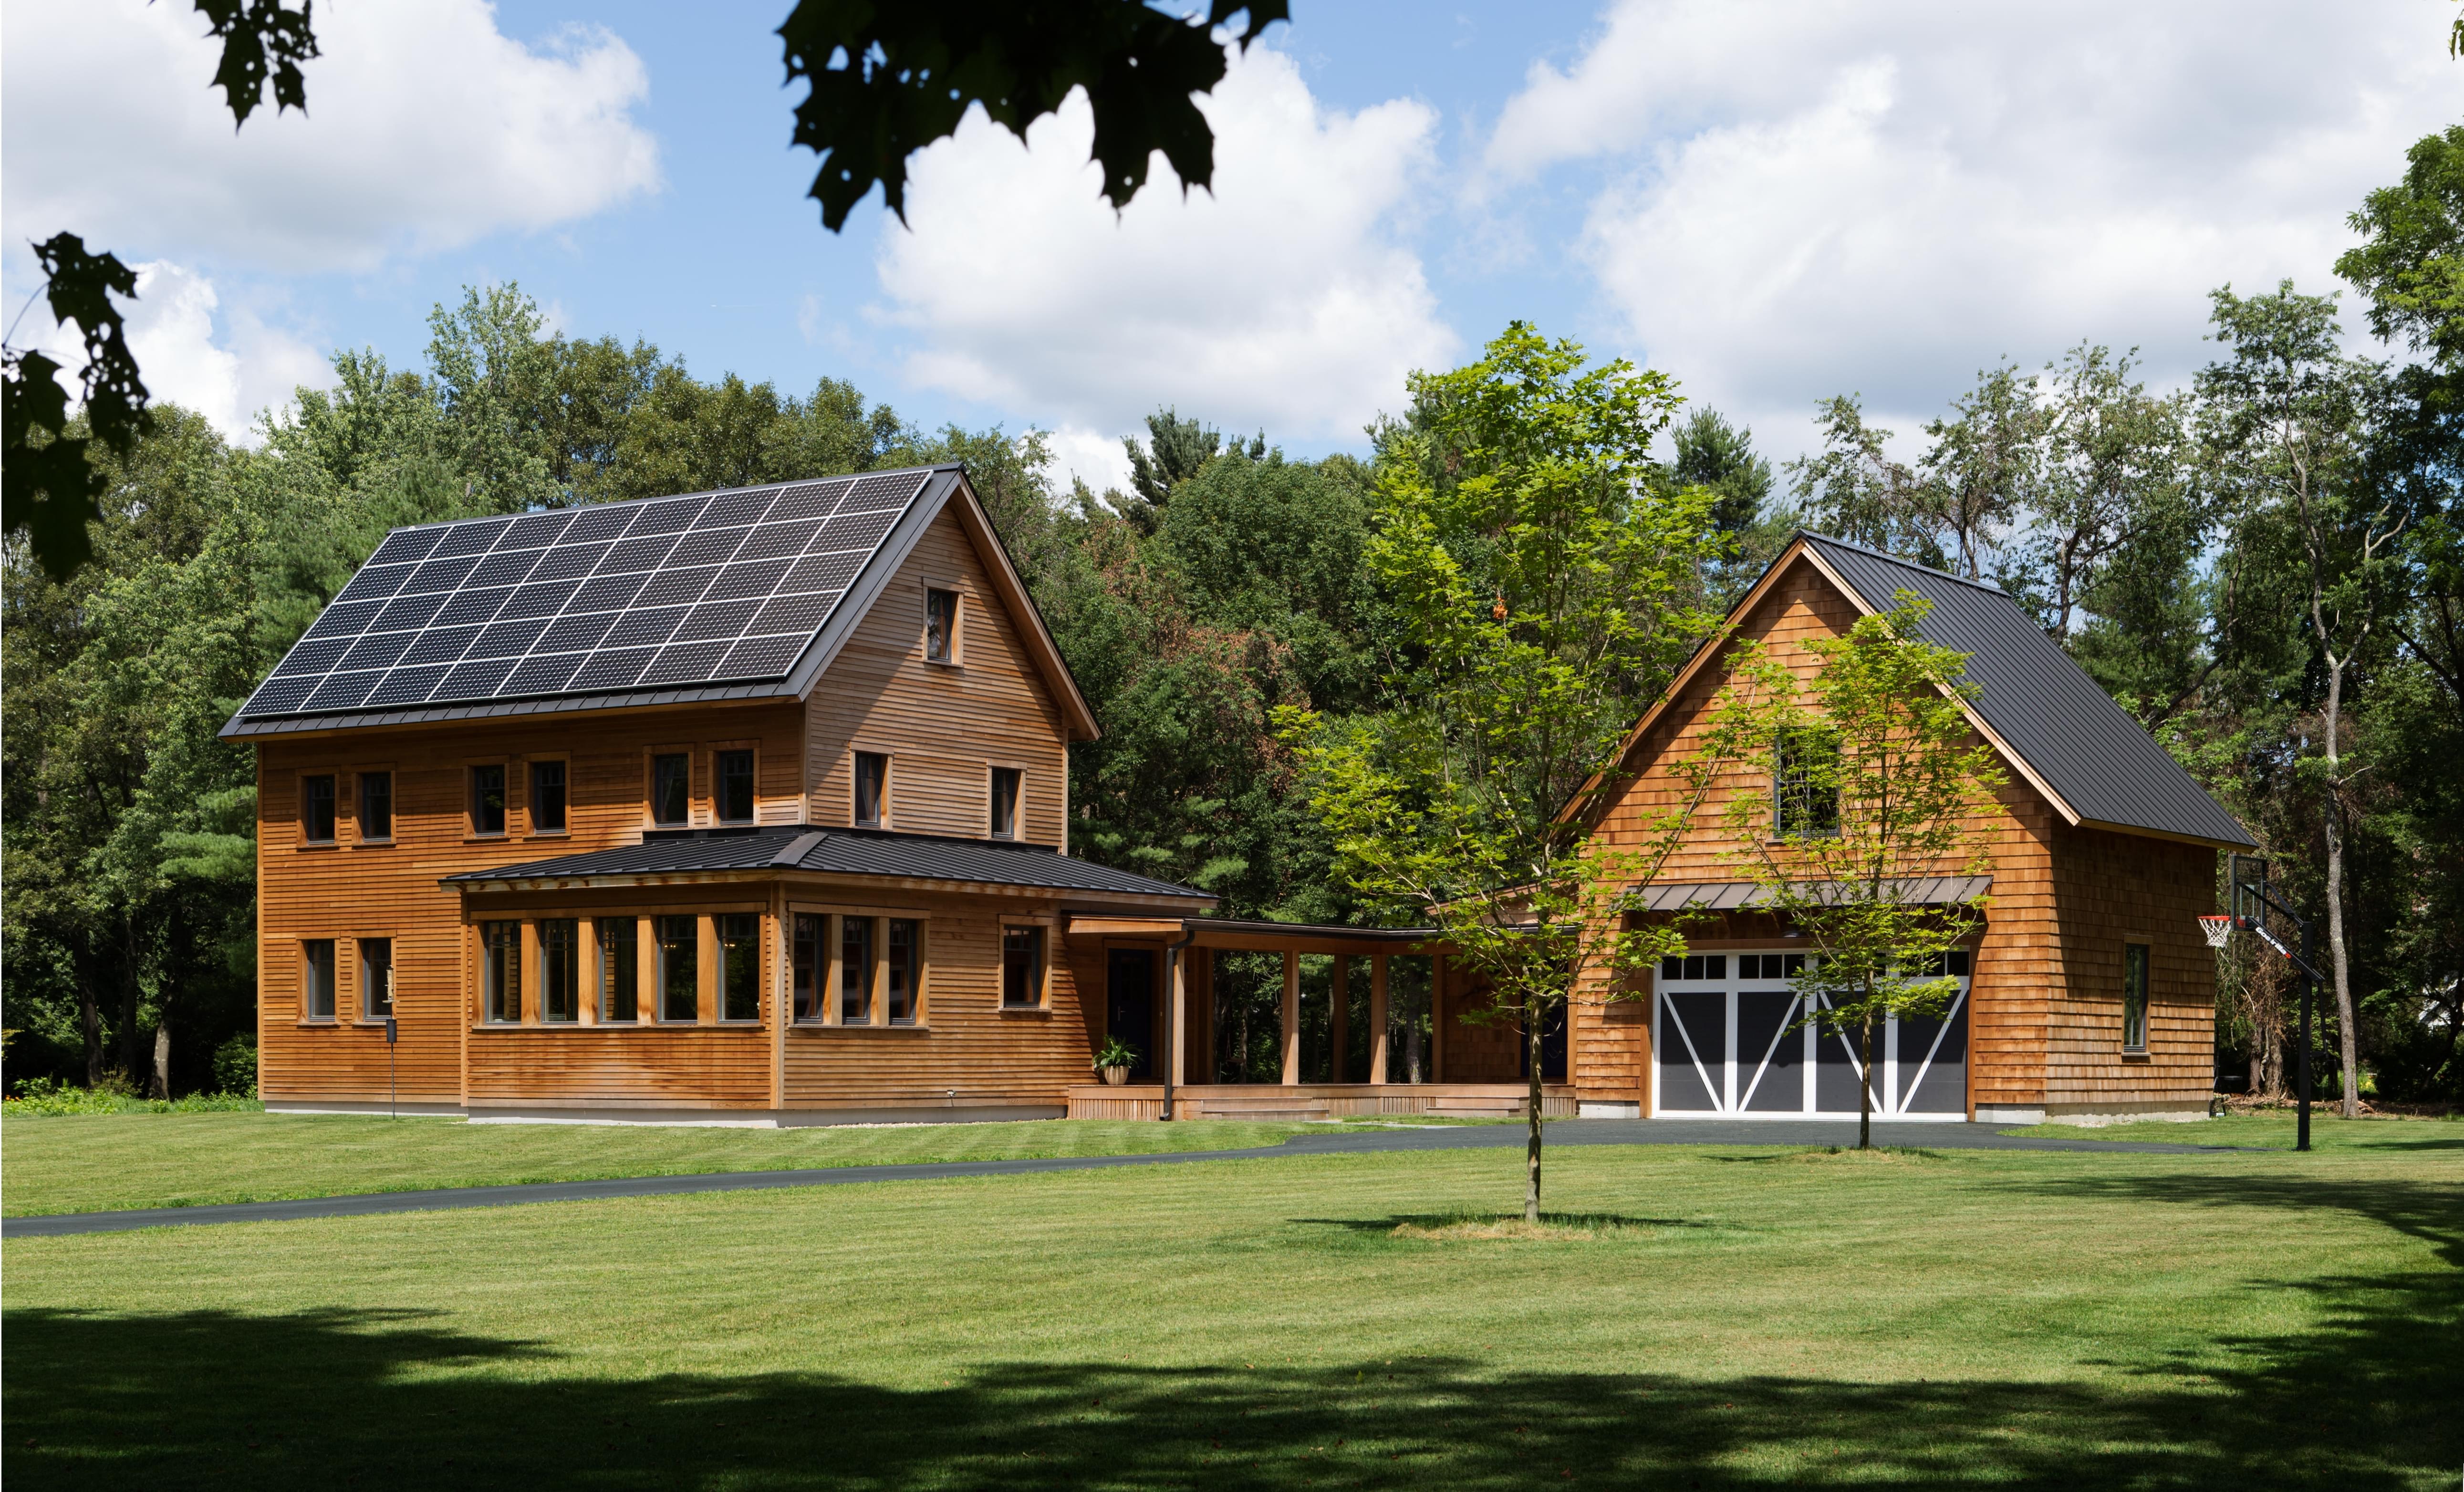 Best Energy Smart Home Fine Homebuilding S 2017 Houses Awards